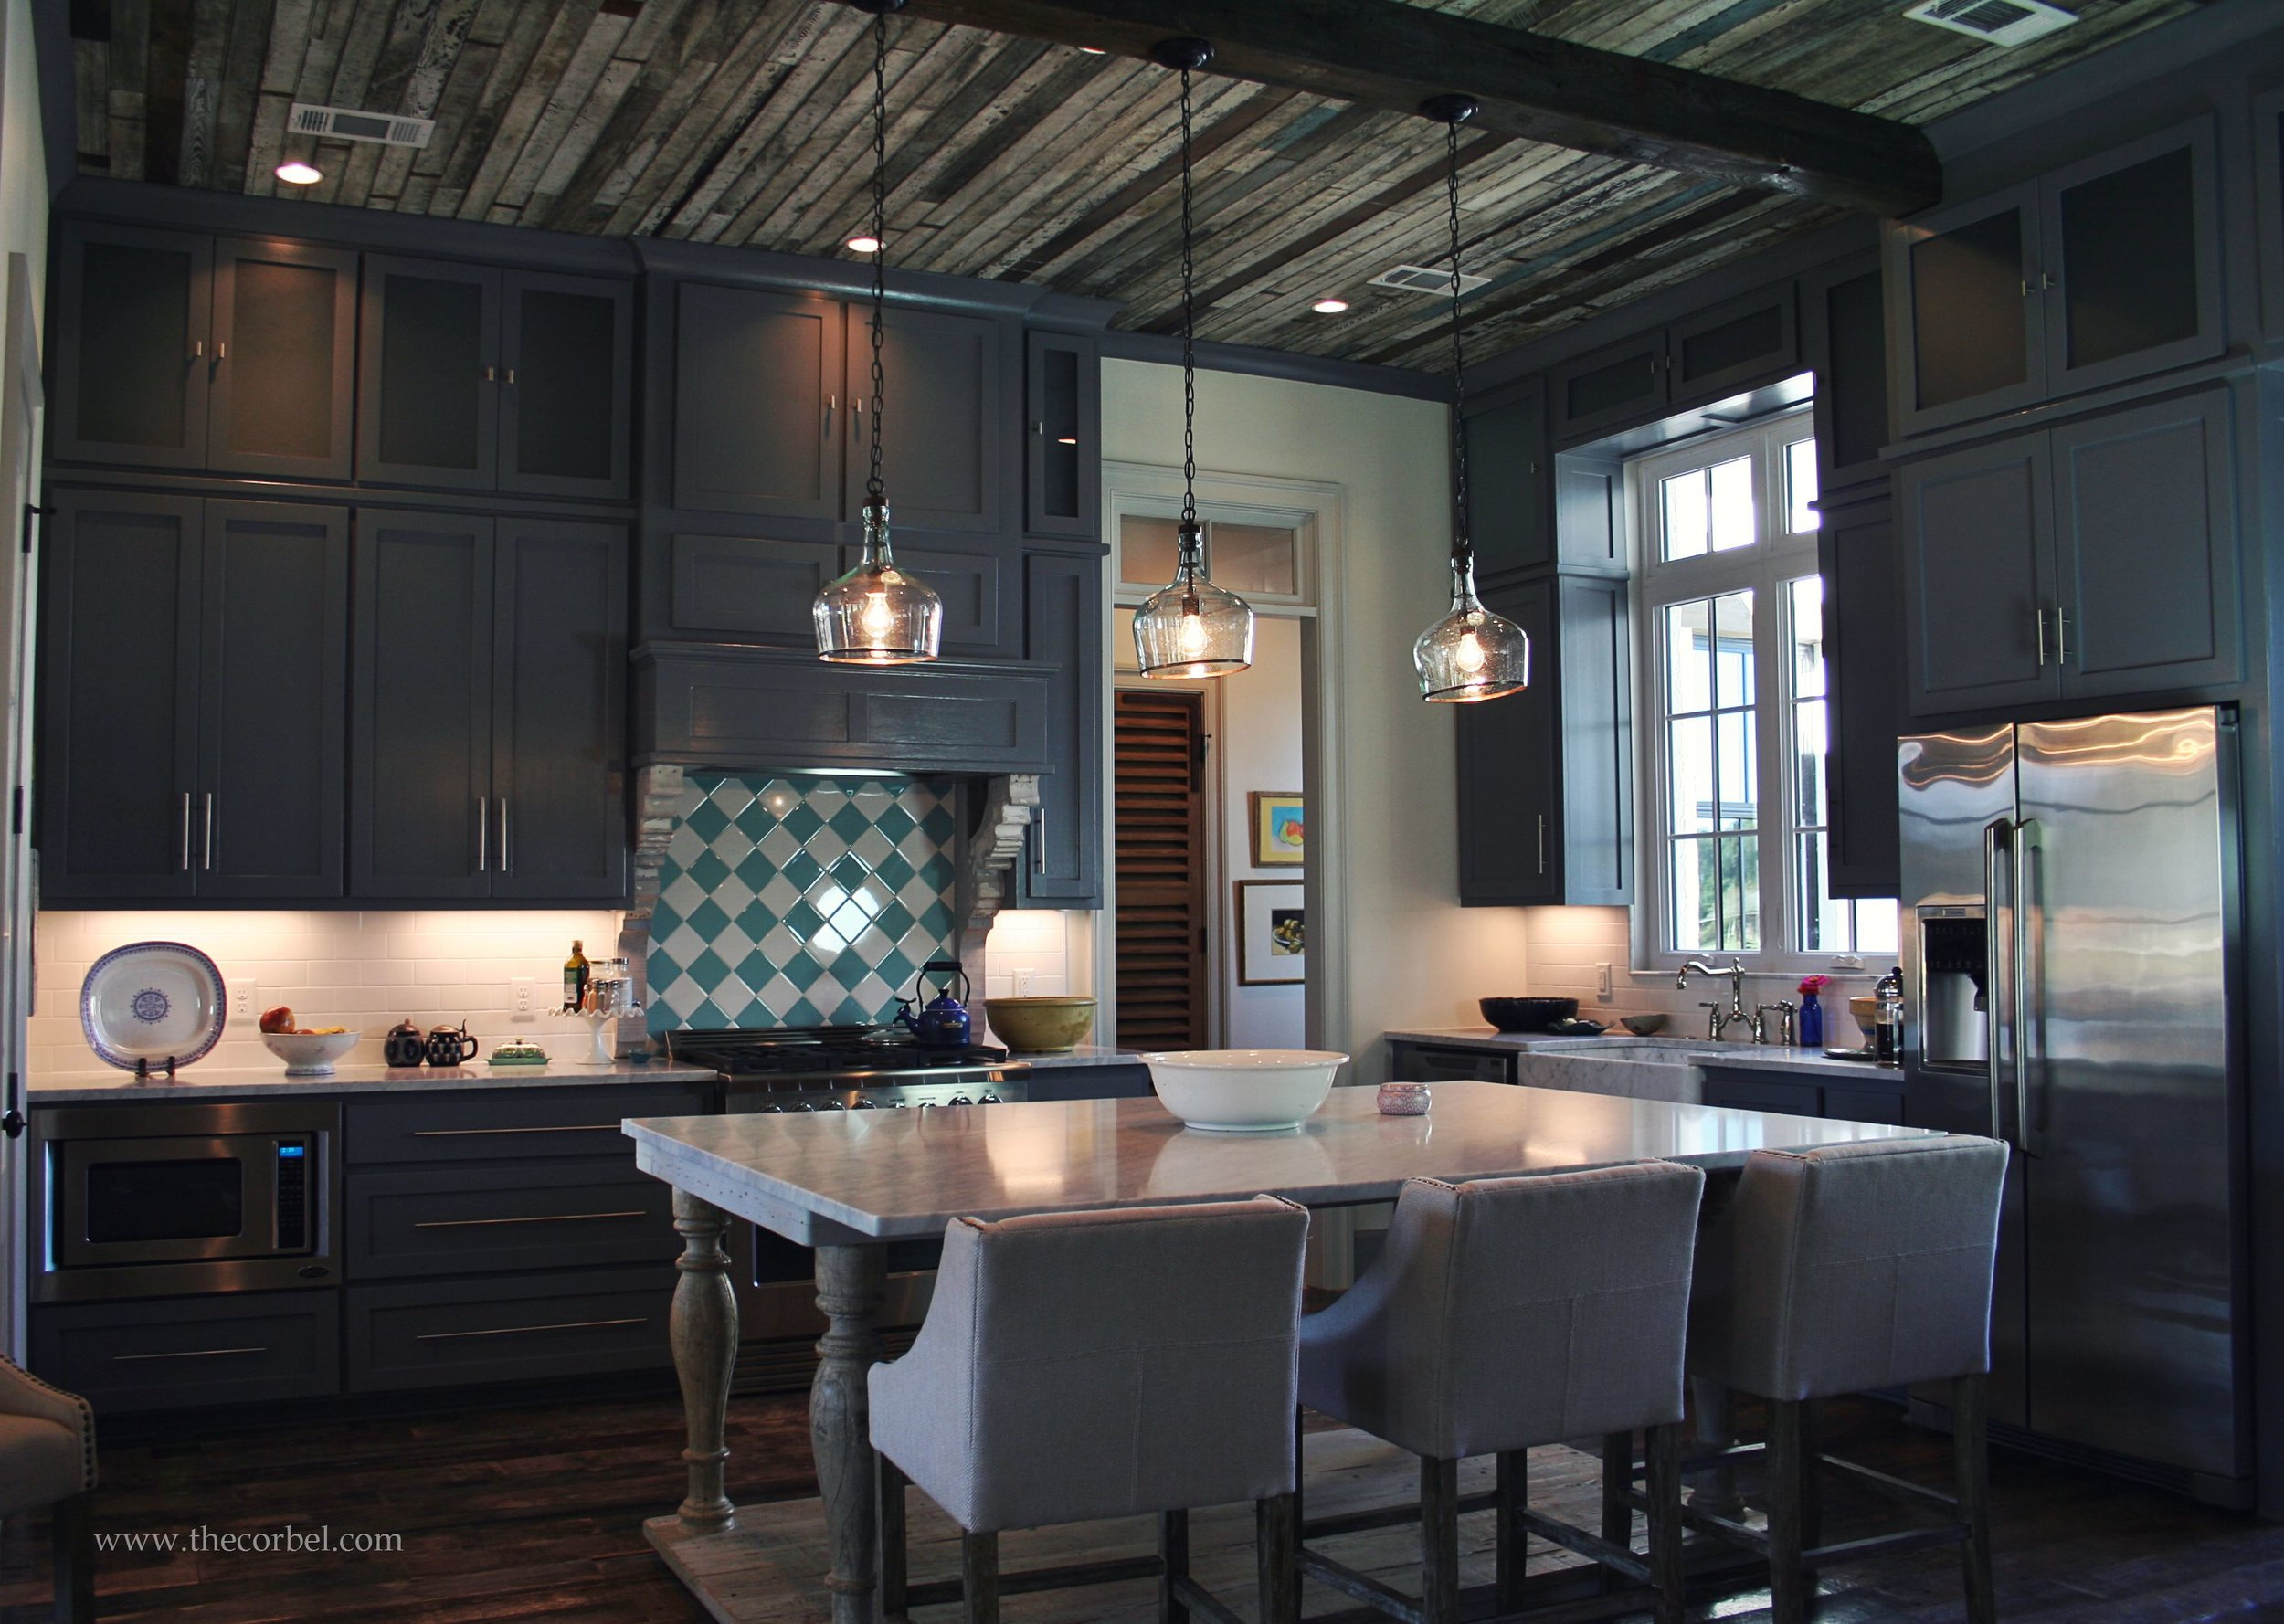 Charlet kitchen2 FTC.jpg